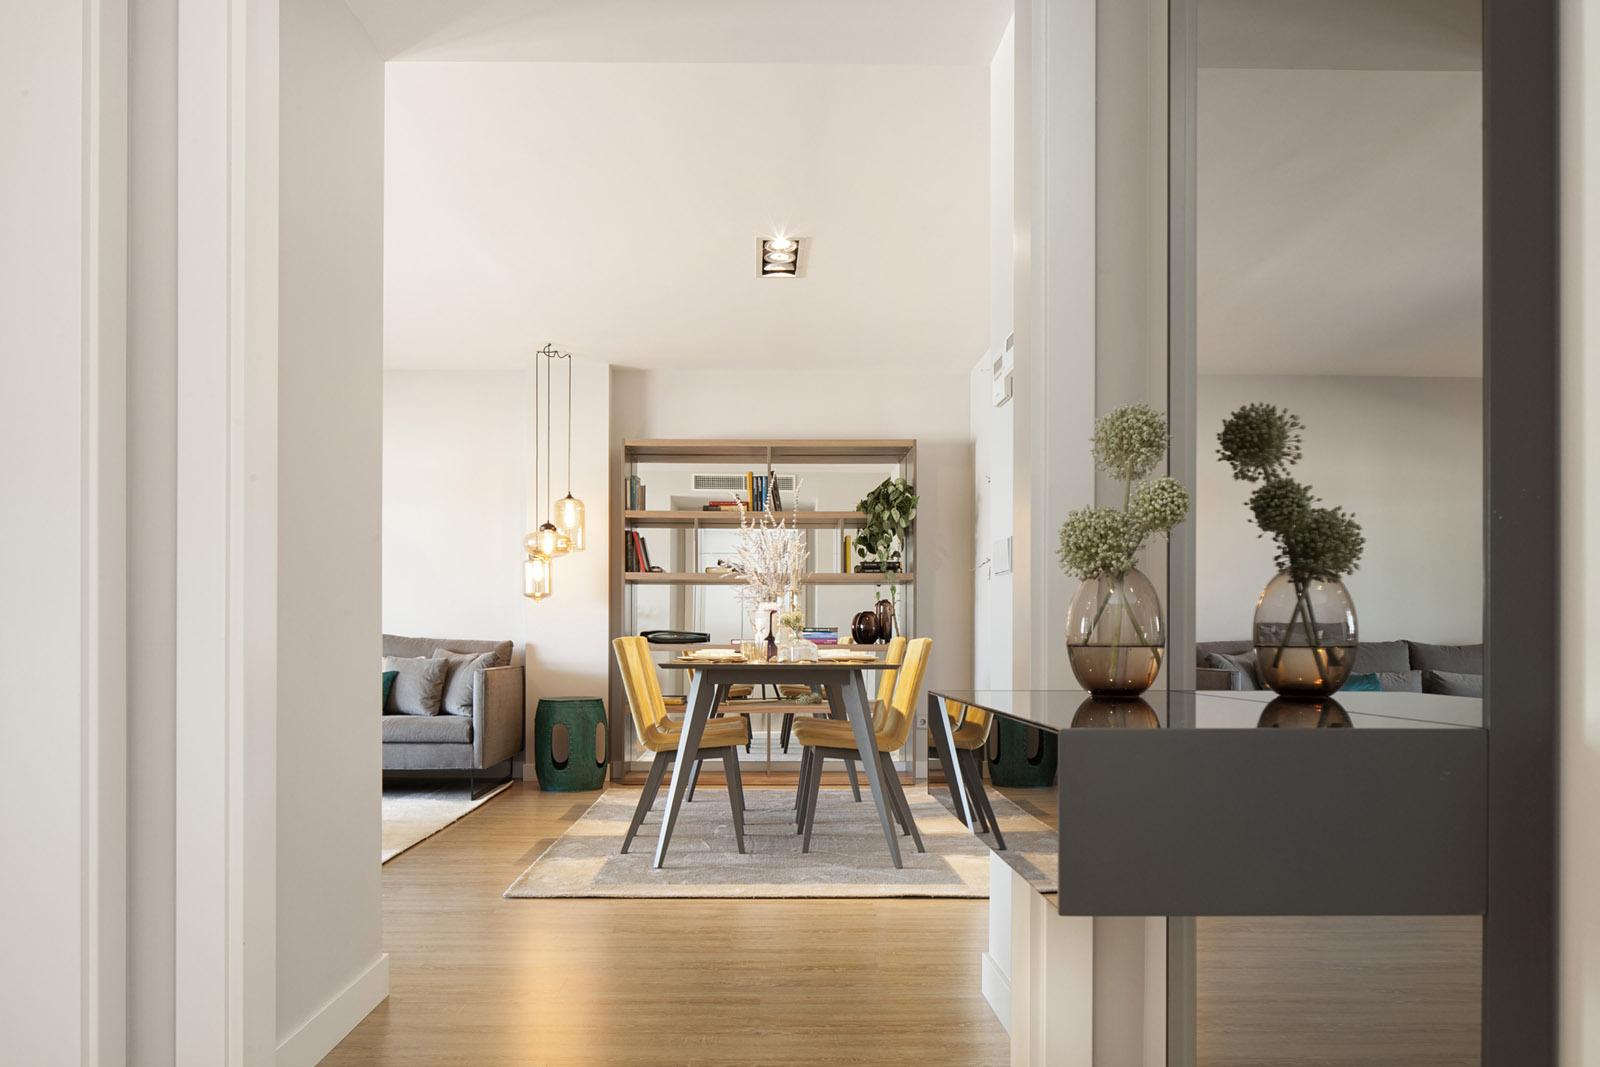 Architectural578-Interior-photographer-Madrid-Spain-.jpg